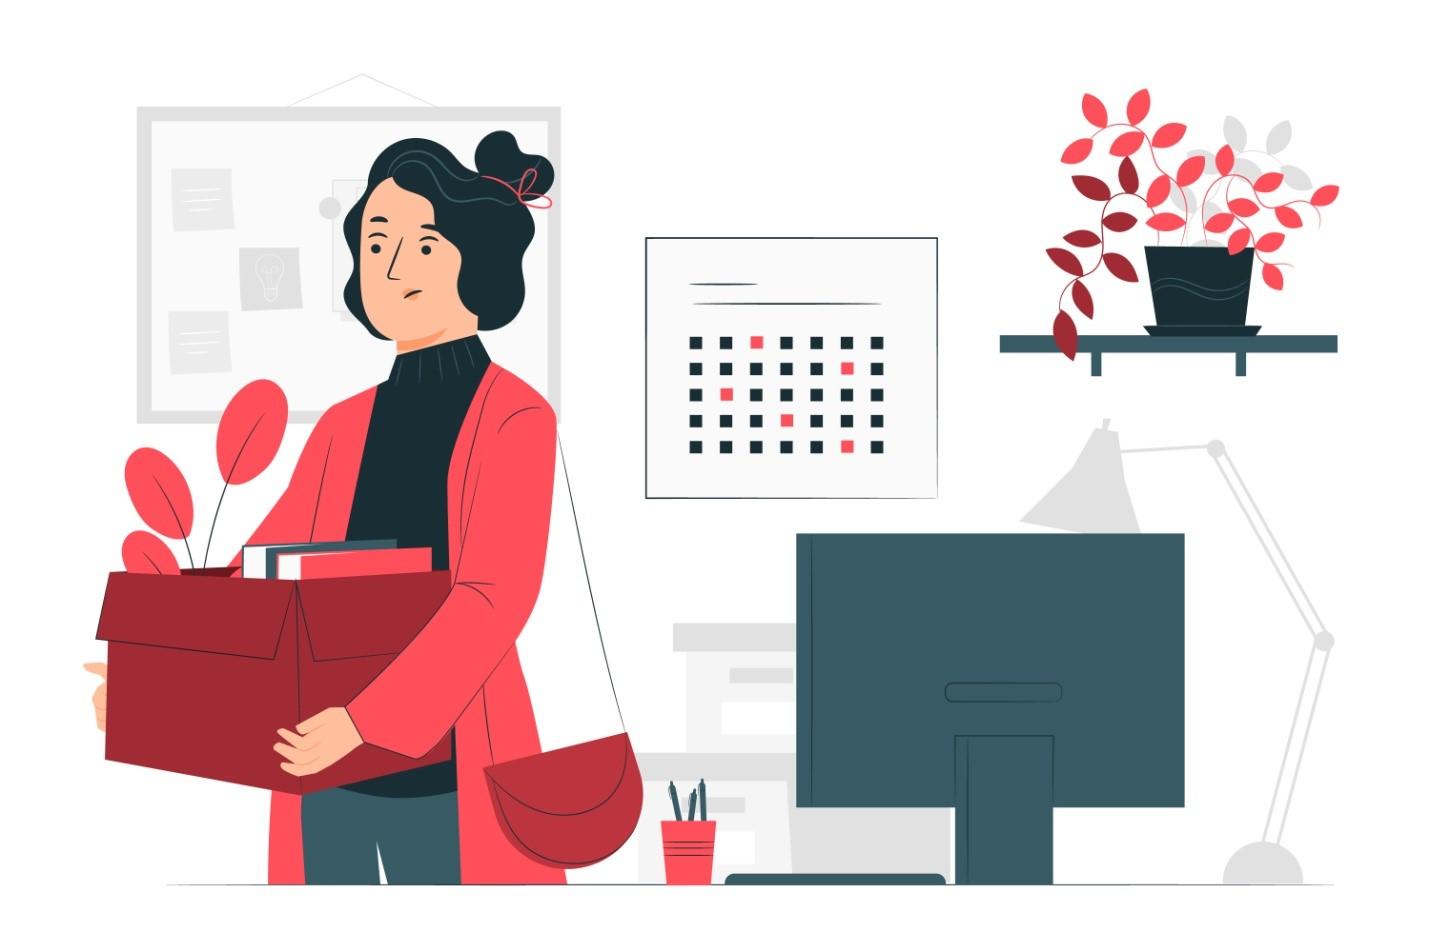 data scientist quitting her job